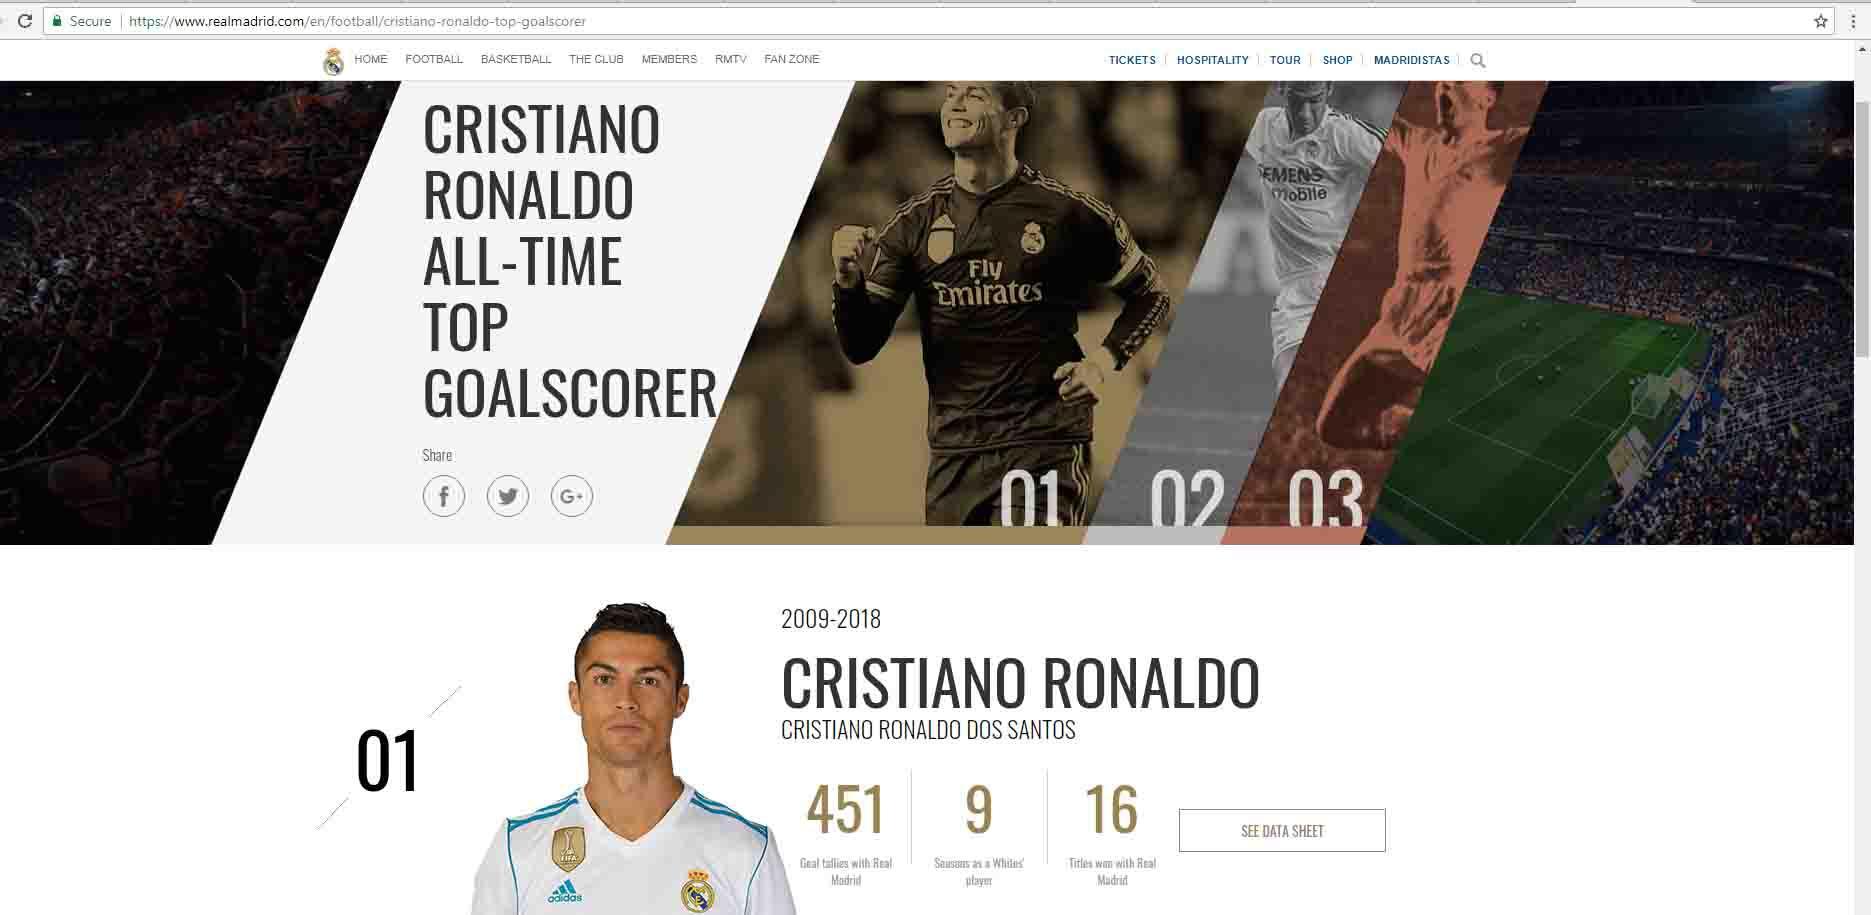 Cristiano Ronalod - Real Madrid Copyright: www.realmadrid.com